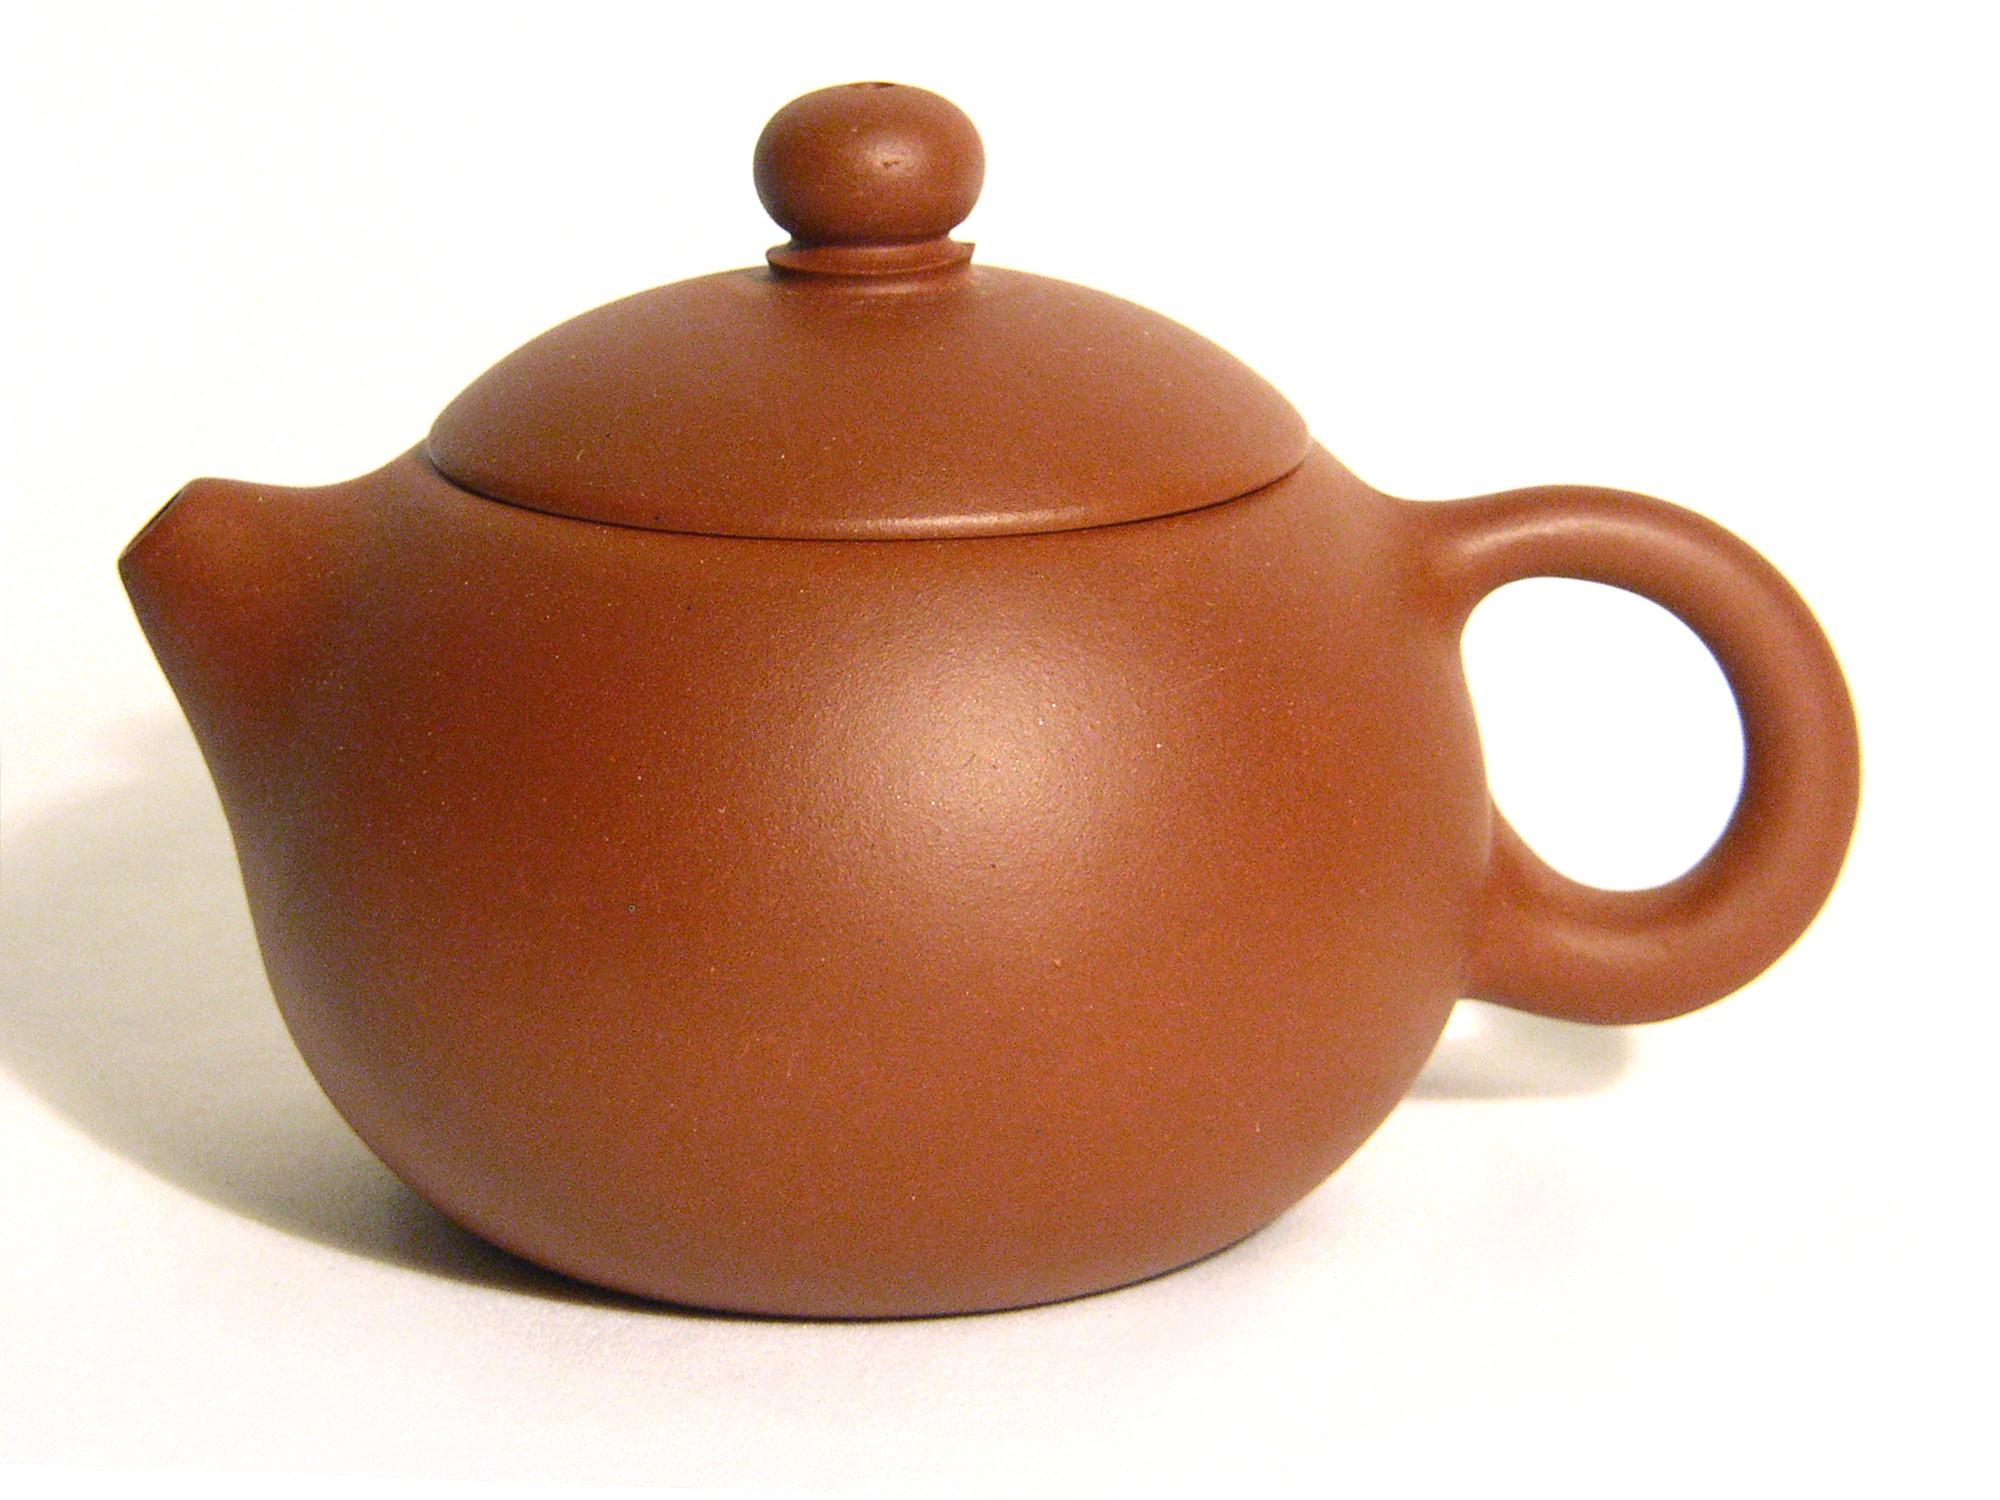 Yixing / Purple Clay Teapot - Round Bubble